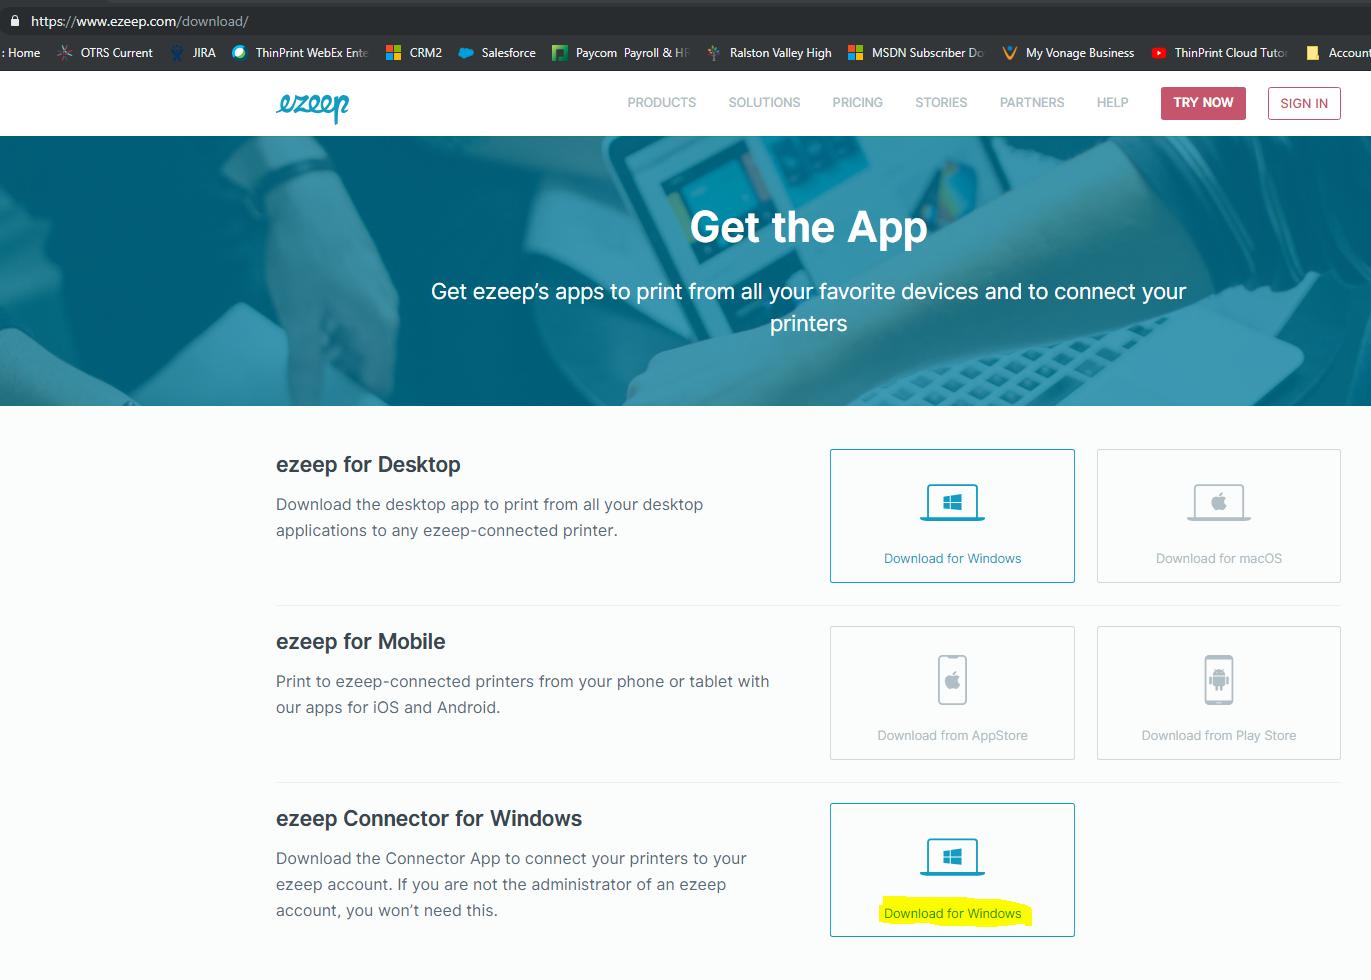 screenshot: download the ezeep connector